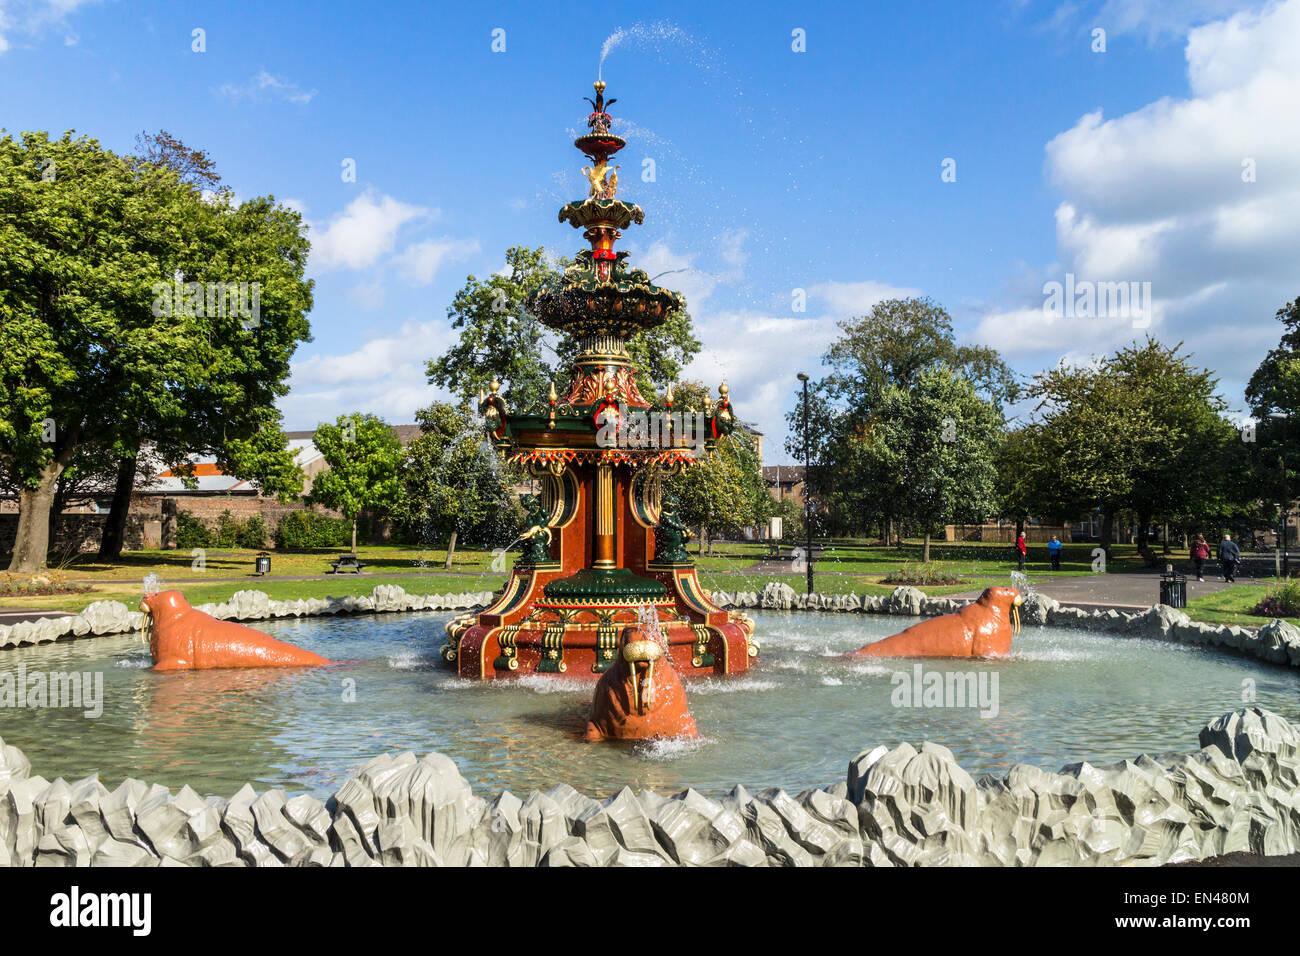 Stock Photo   The Newly Restored Victorian Fountain, Fountain Gardens